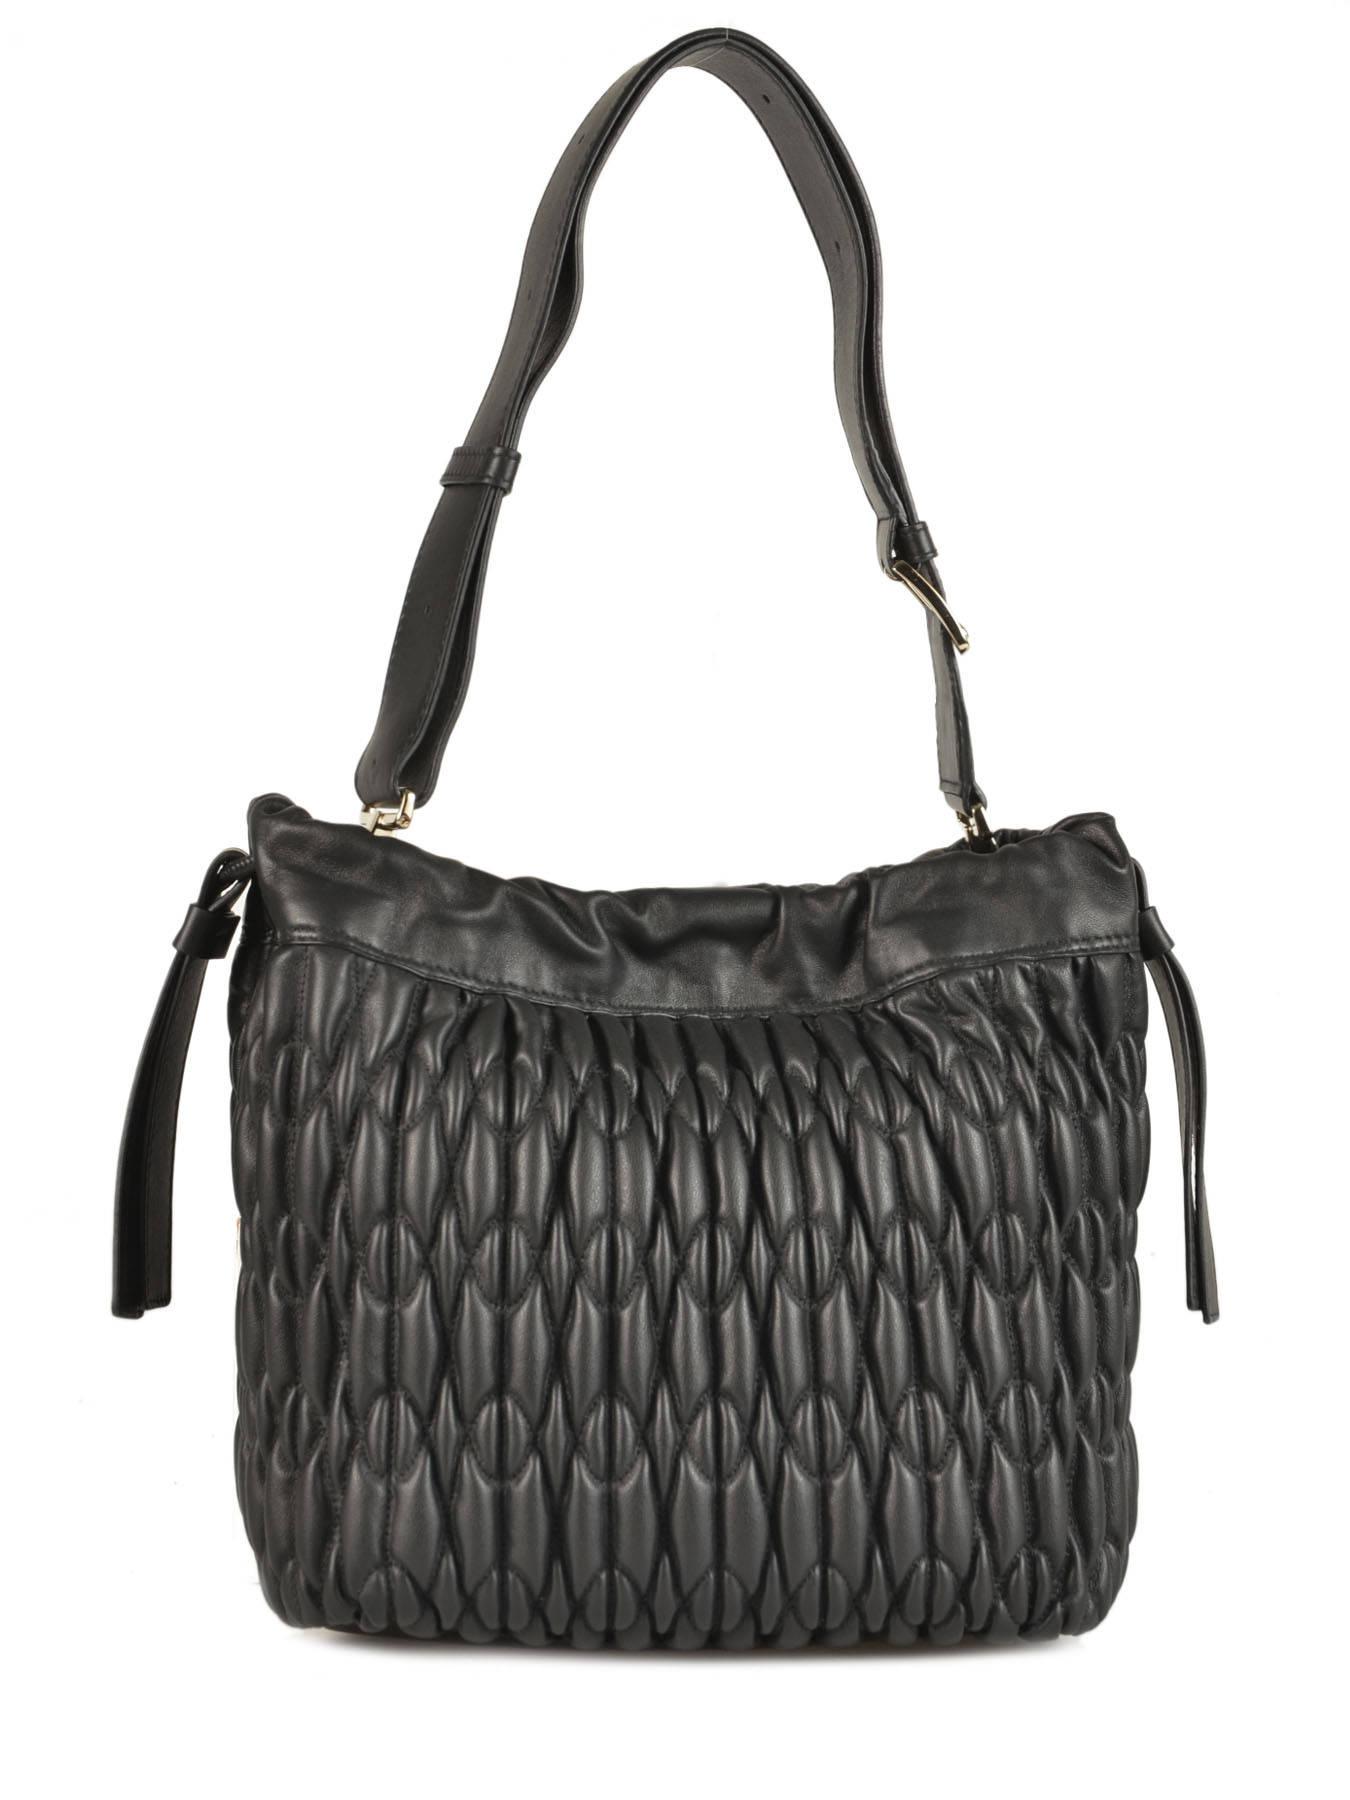 Bucket Bag Caos Leather Furla Black caos CAO-BLJ5